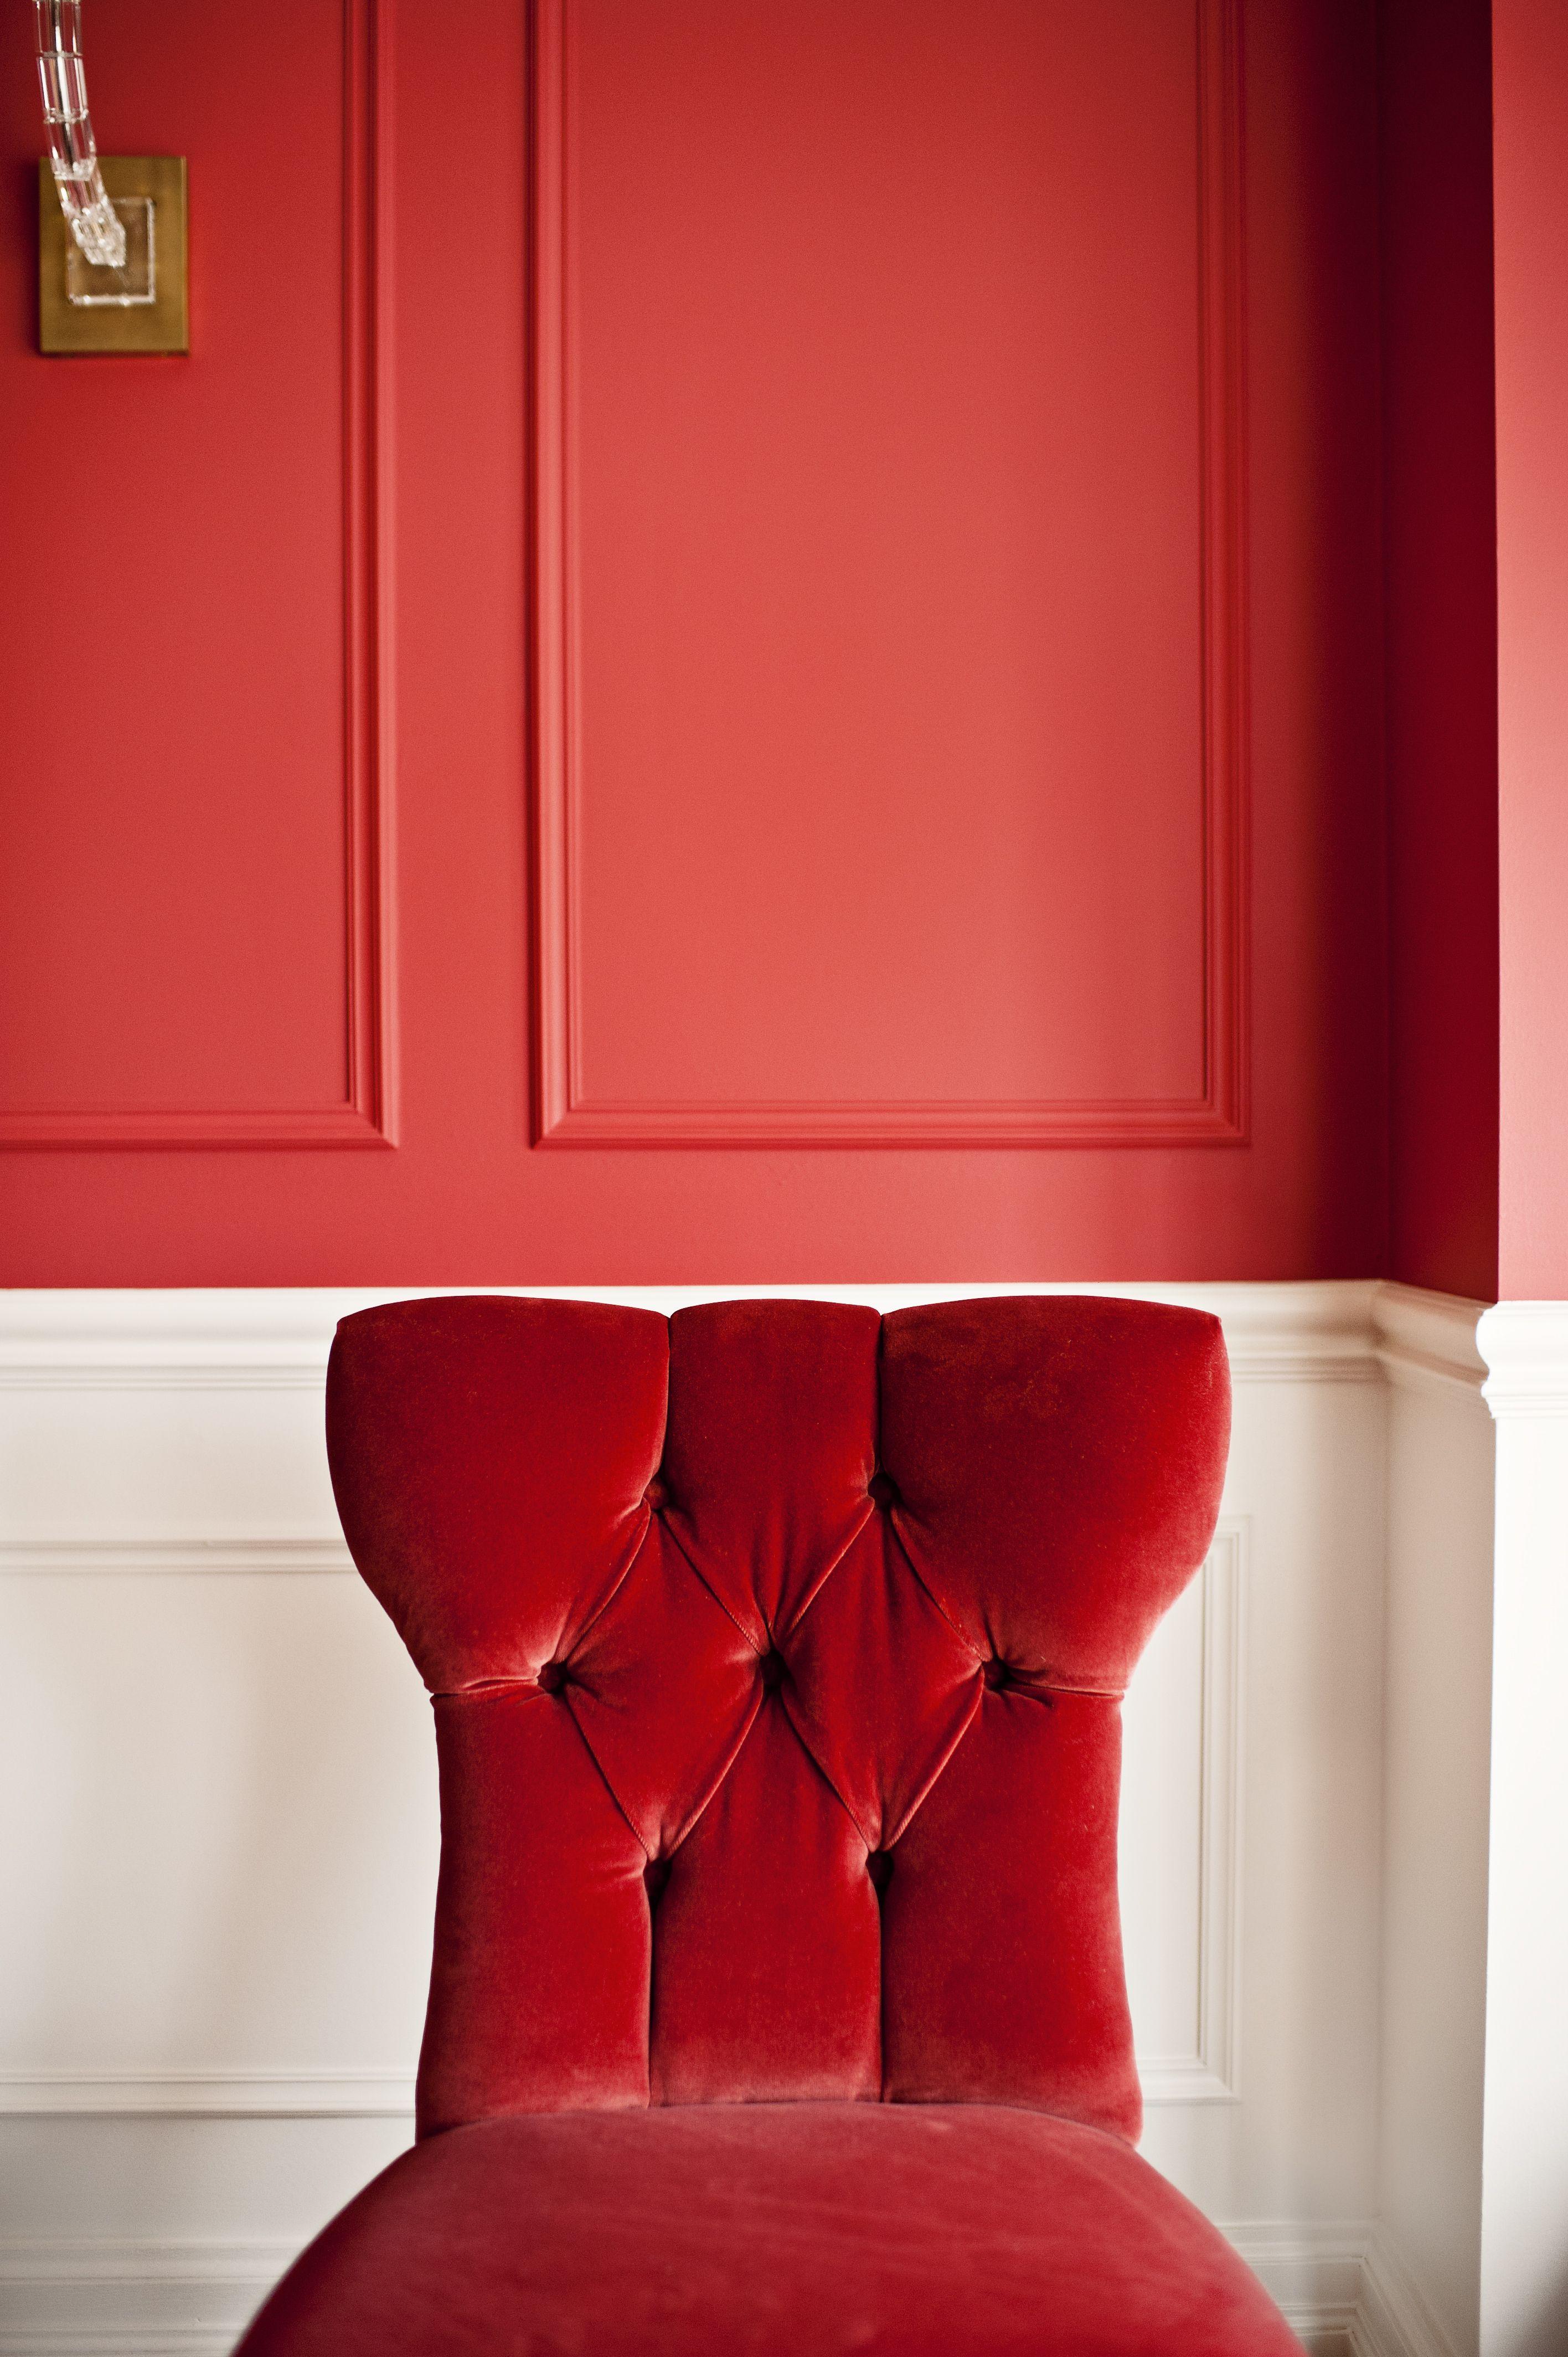 Dining Room designed by Elizabeth Metcalfe Interiors & Design Inc. www.emdesign.ca